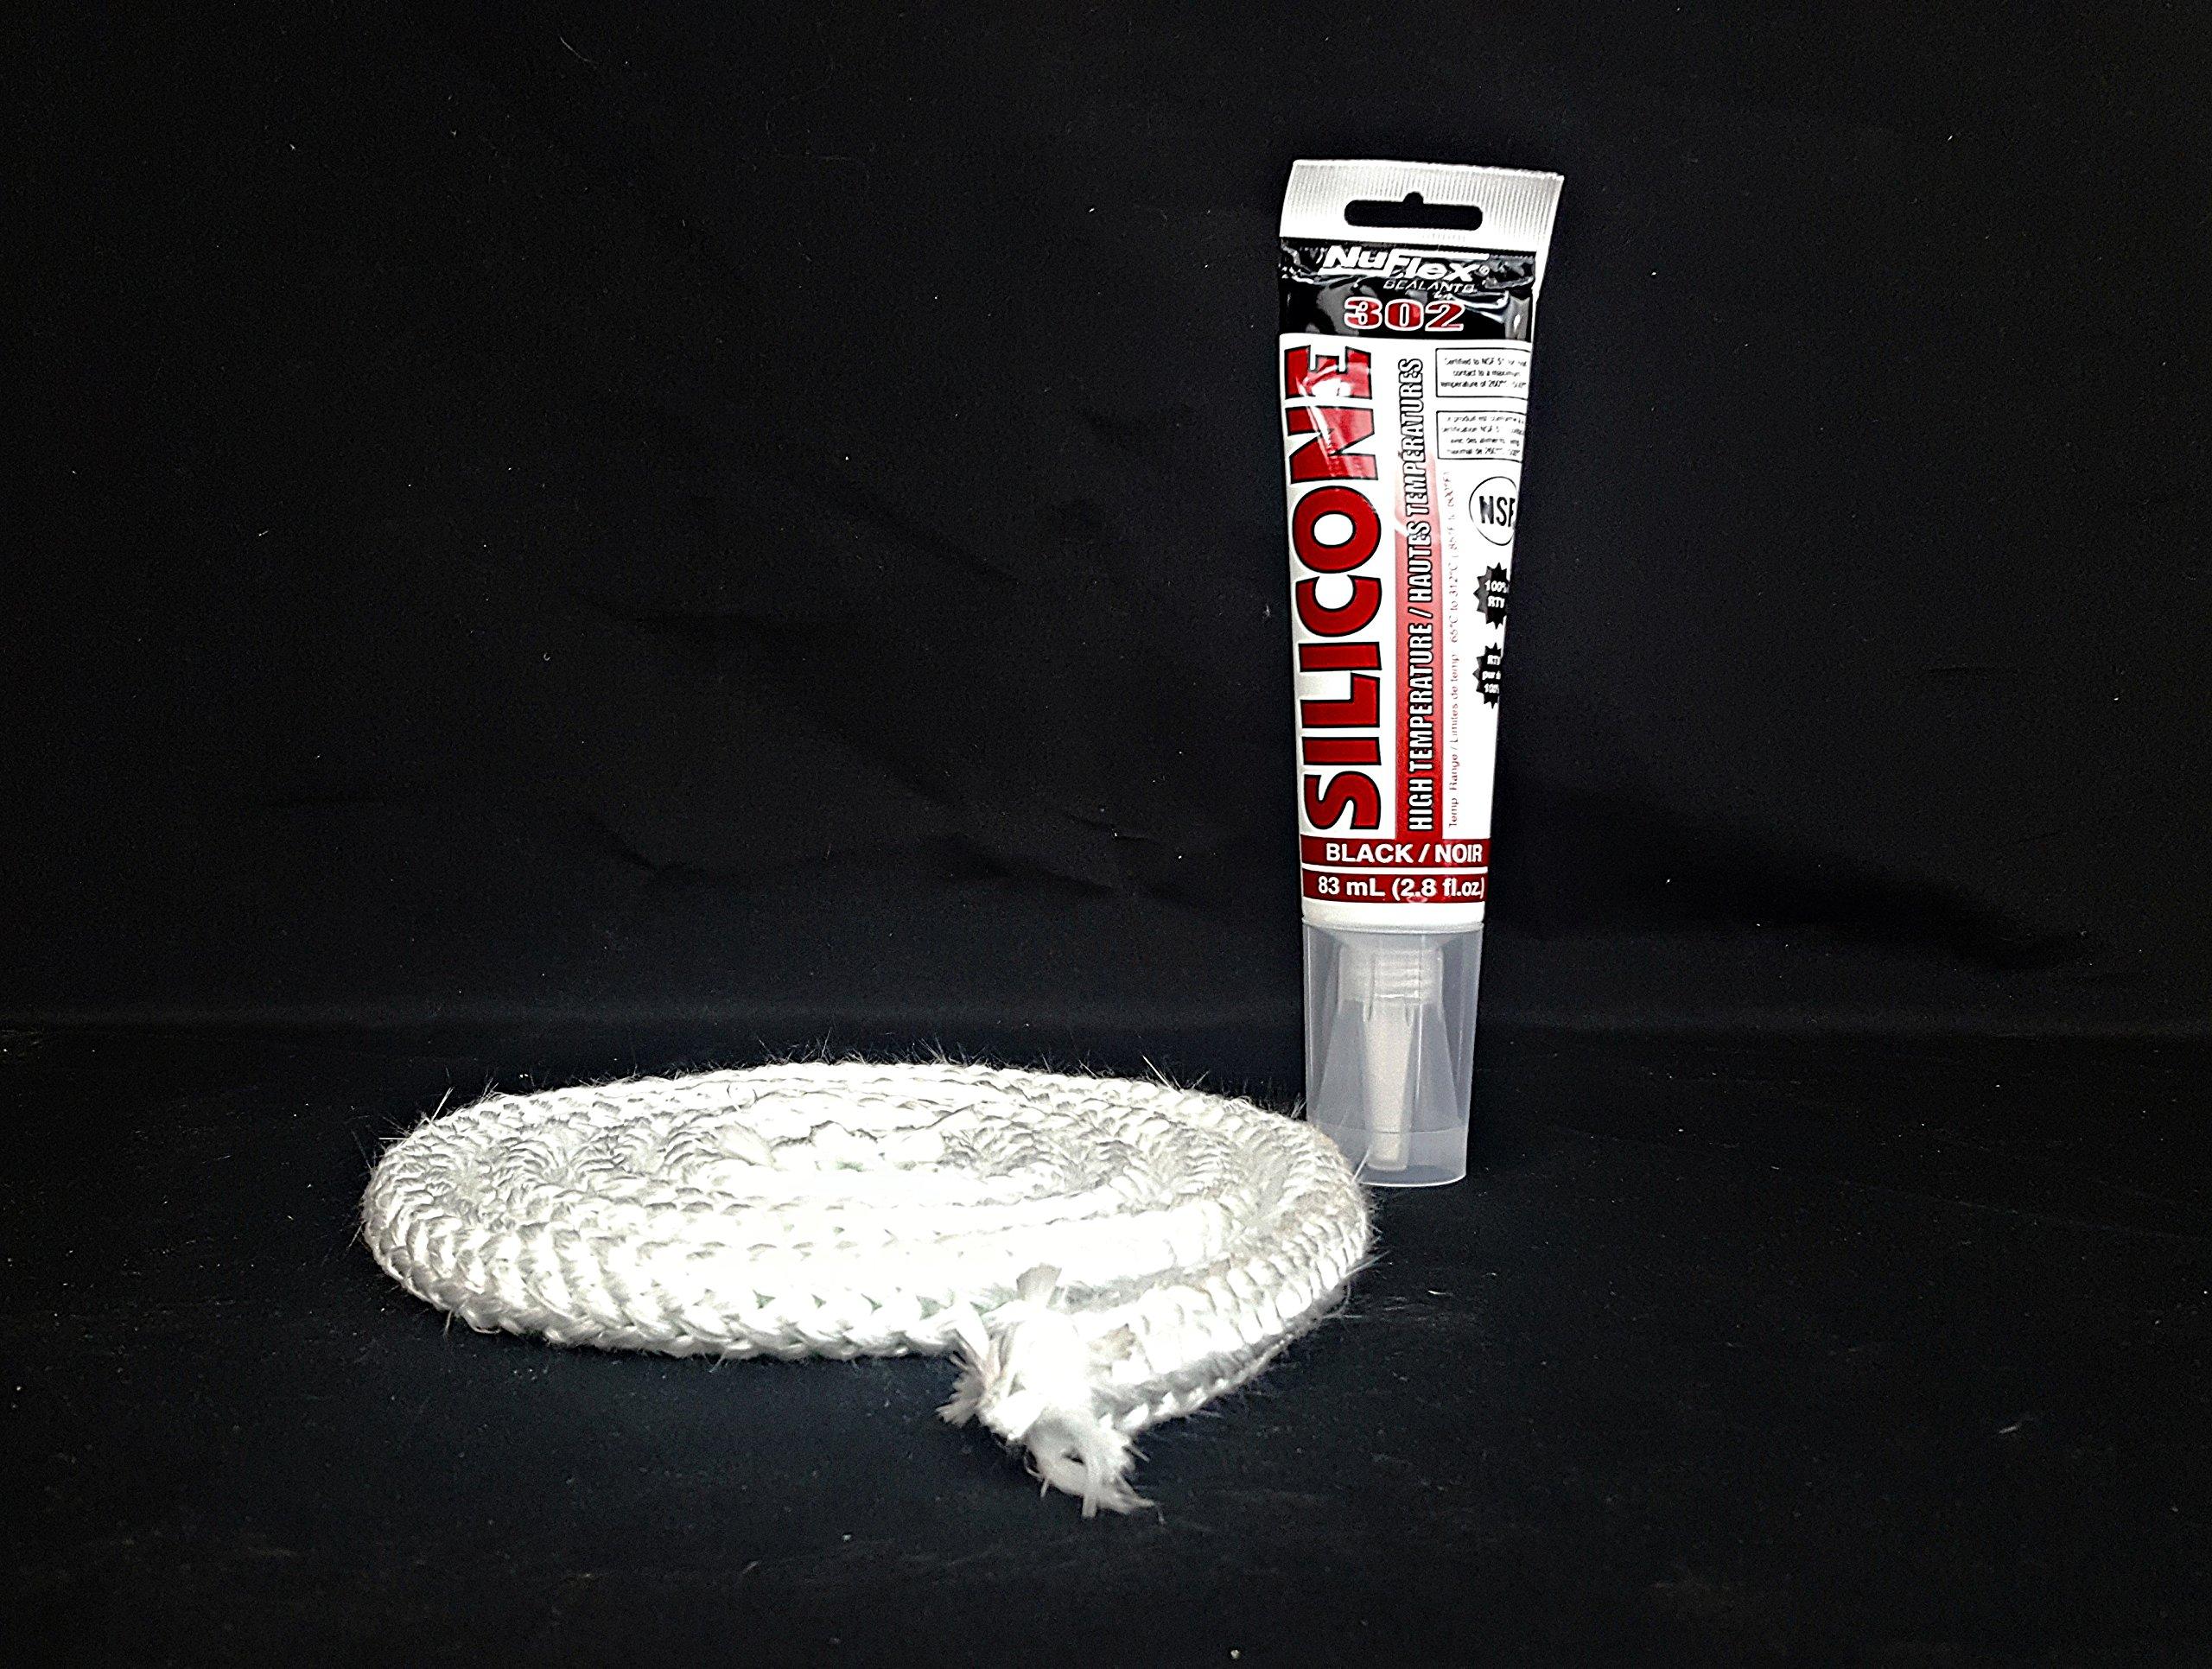 Danson Glowboy 5/8 Rope Door Gasket Seal Kit KS-5060-1160